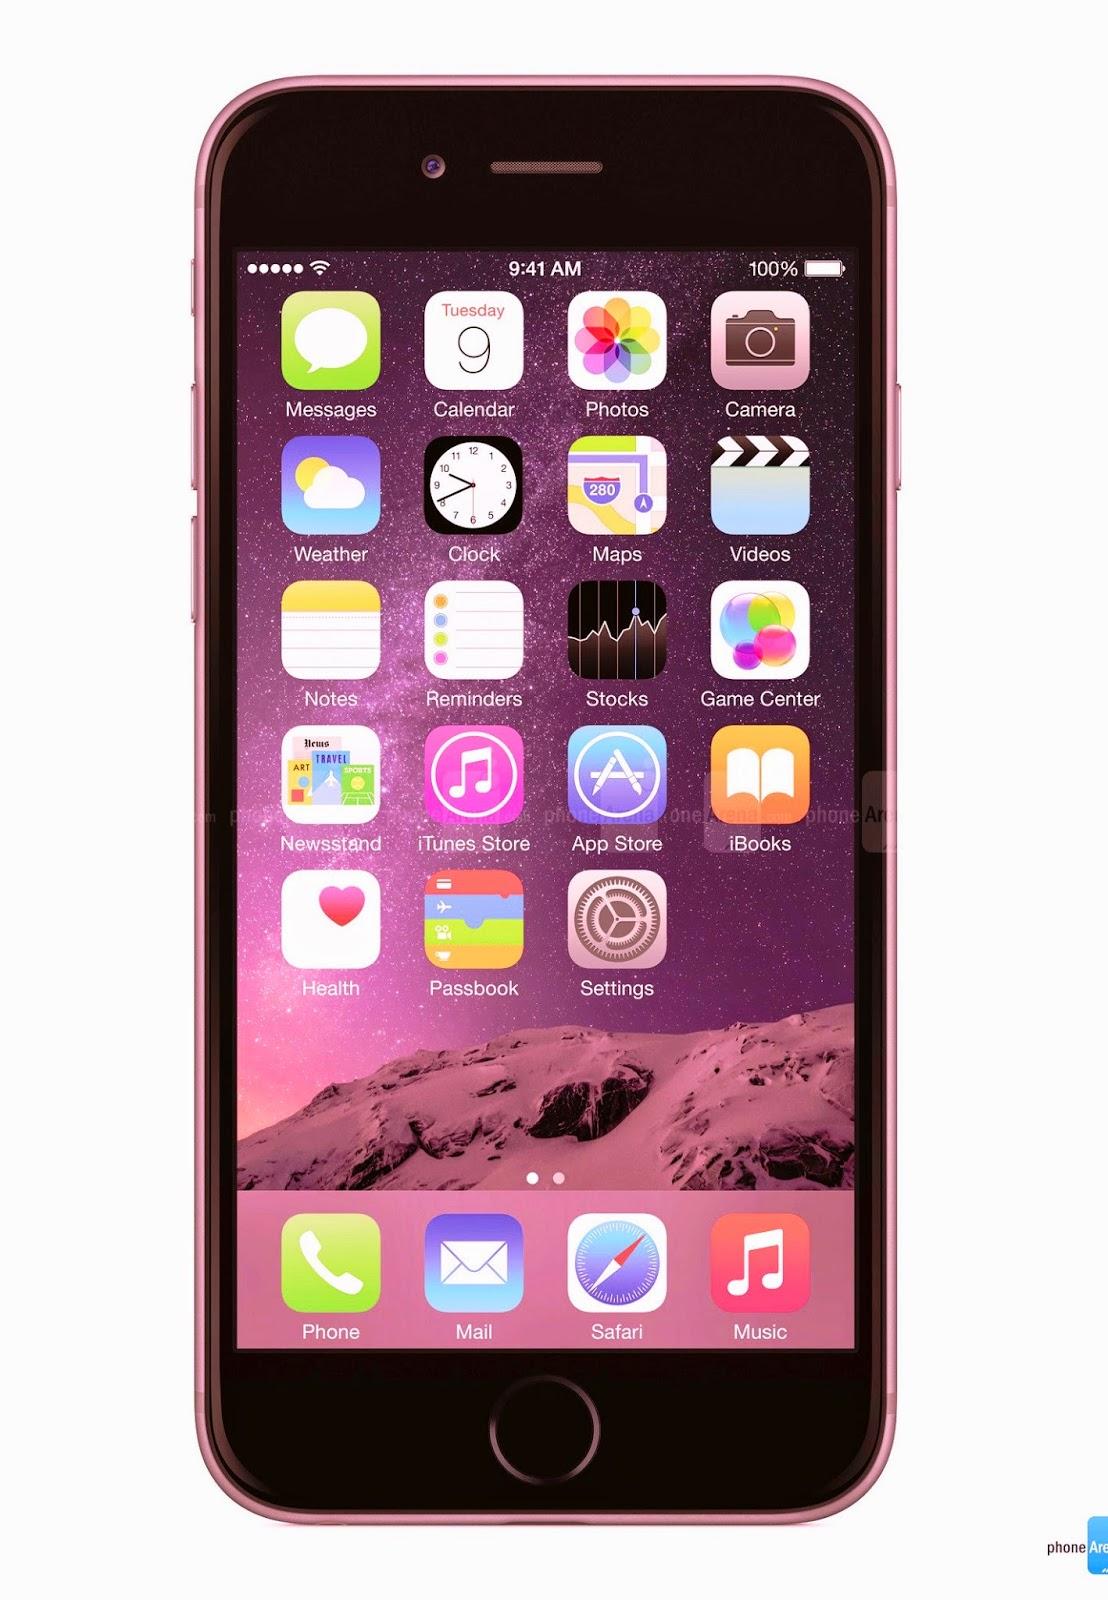 iphone 6, özellikleri, resimleri, fotografları, incelik,ekran, iPhone 6, характеристики, фотографии, фотографии, утонченность, дисплей, सुविधाओं, चित्र, तस्वीरें, चालाकी, प्रदर्शन, 功能,圖片,照片,手腕,顯示 features, pictures, photographs, finesse, display,